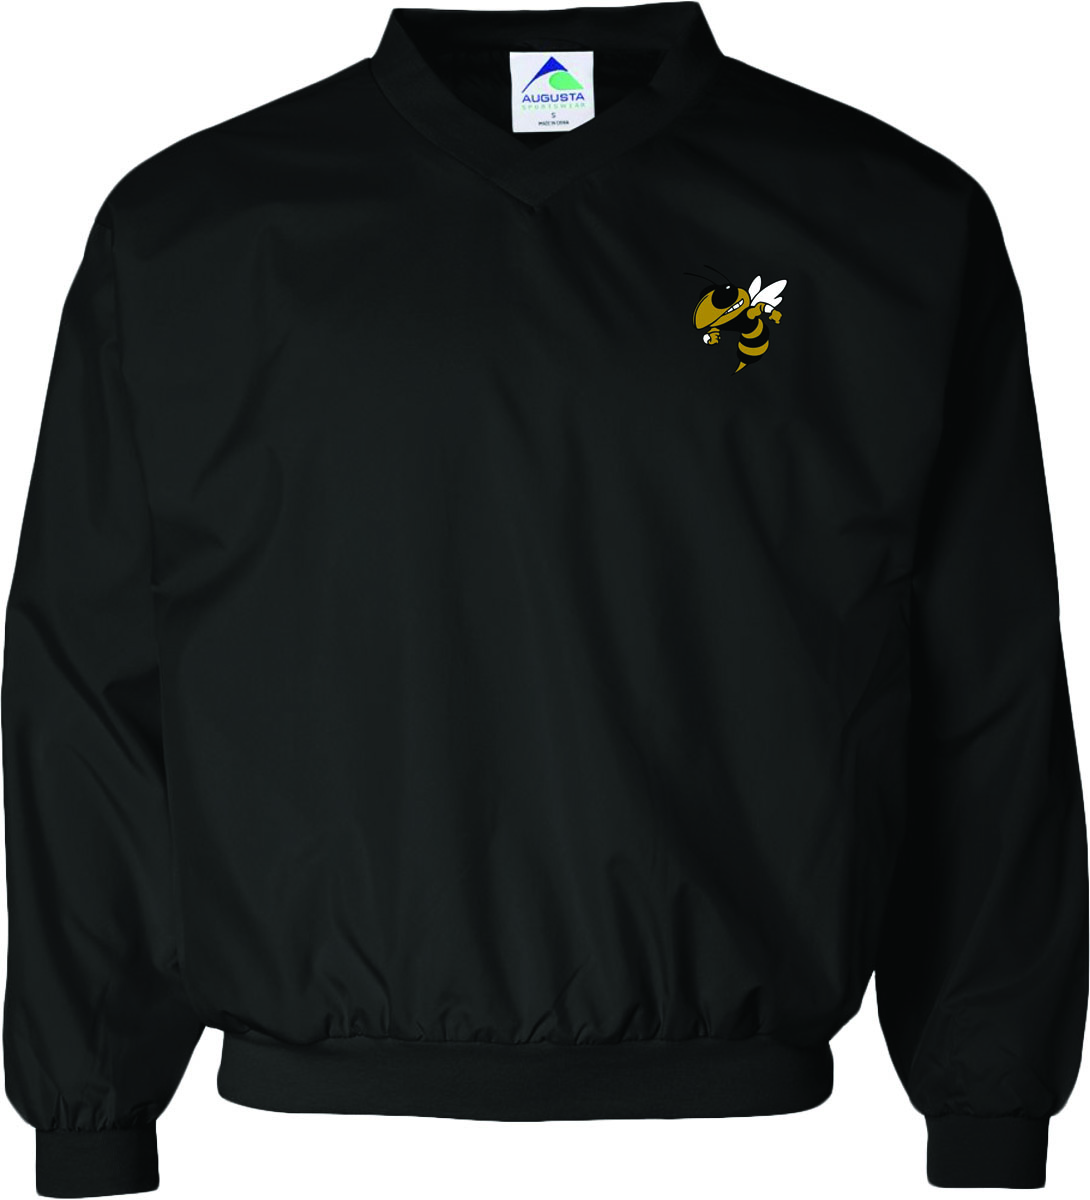 Oxford Yellow Jackets Priletai Com